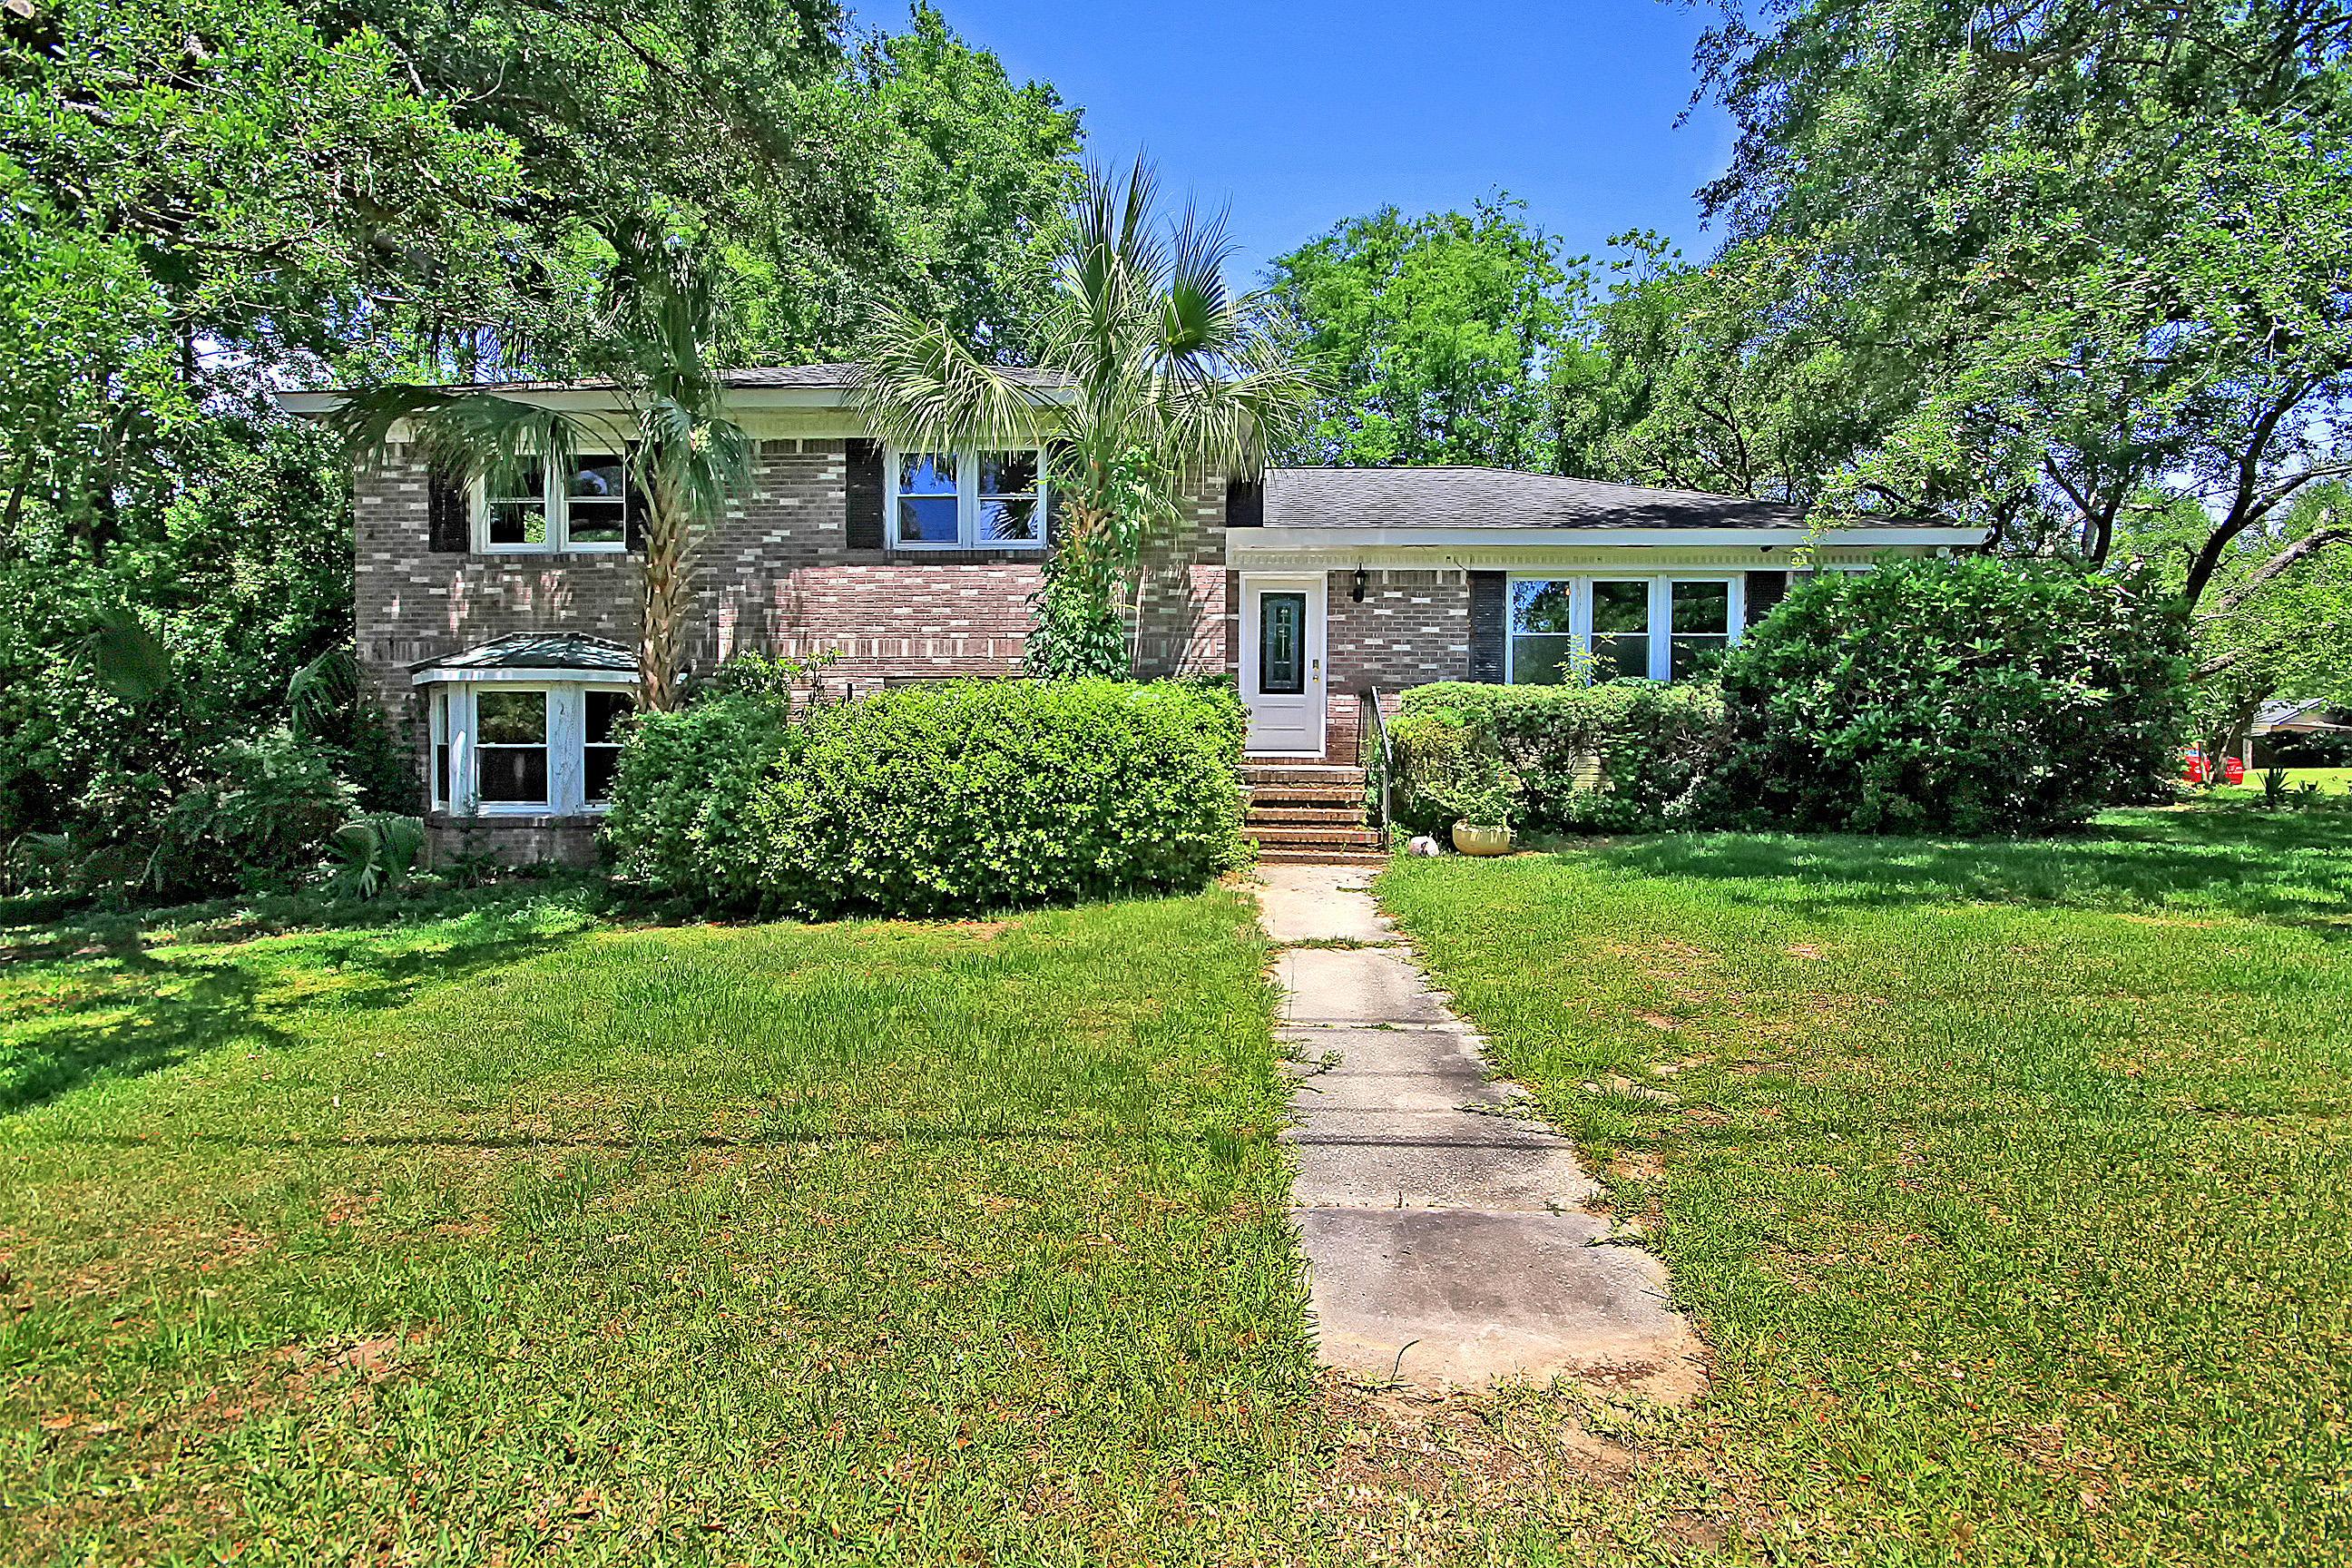 Northbridge Terrace Homes For Sale - 1094 Northbridge, Charleston, SC - 26